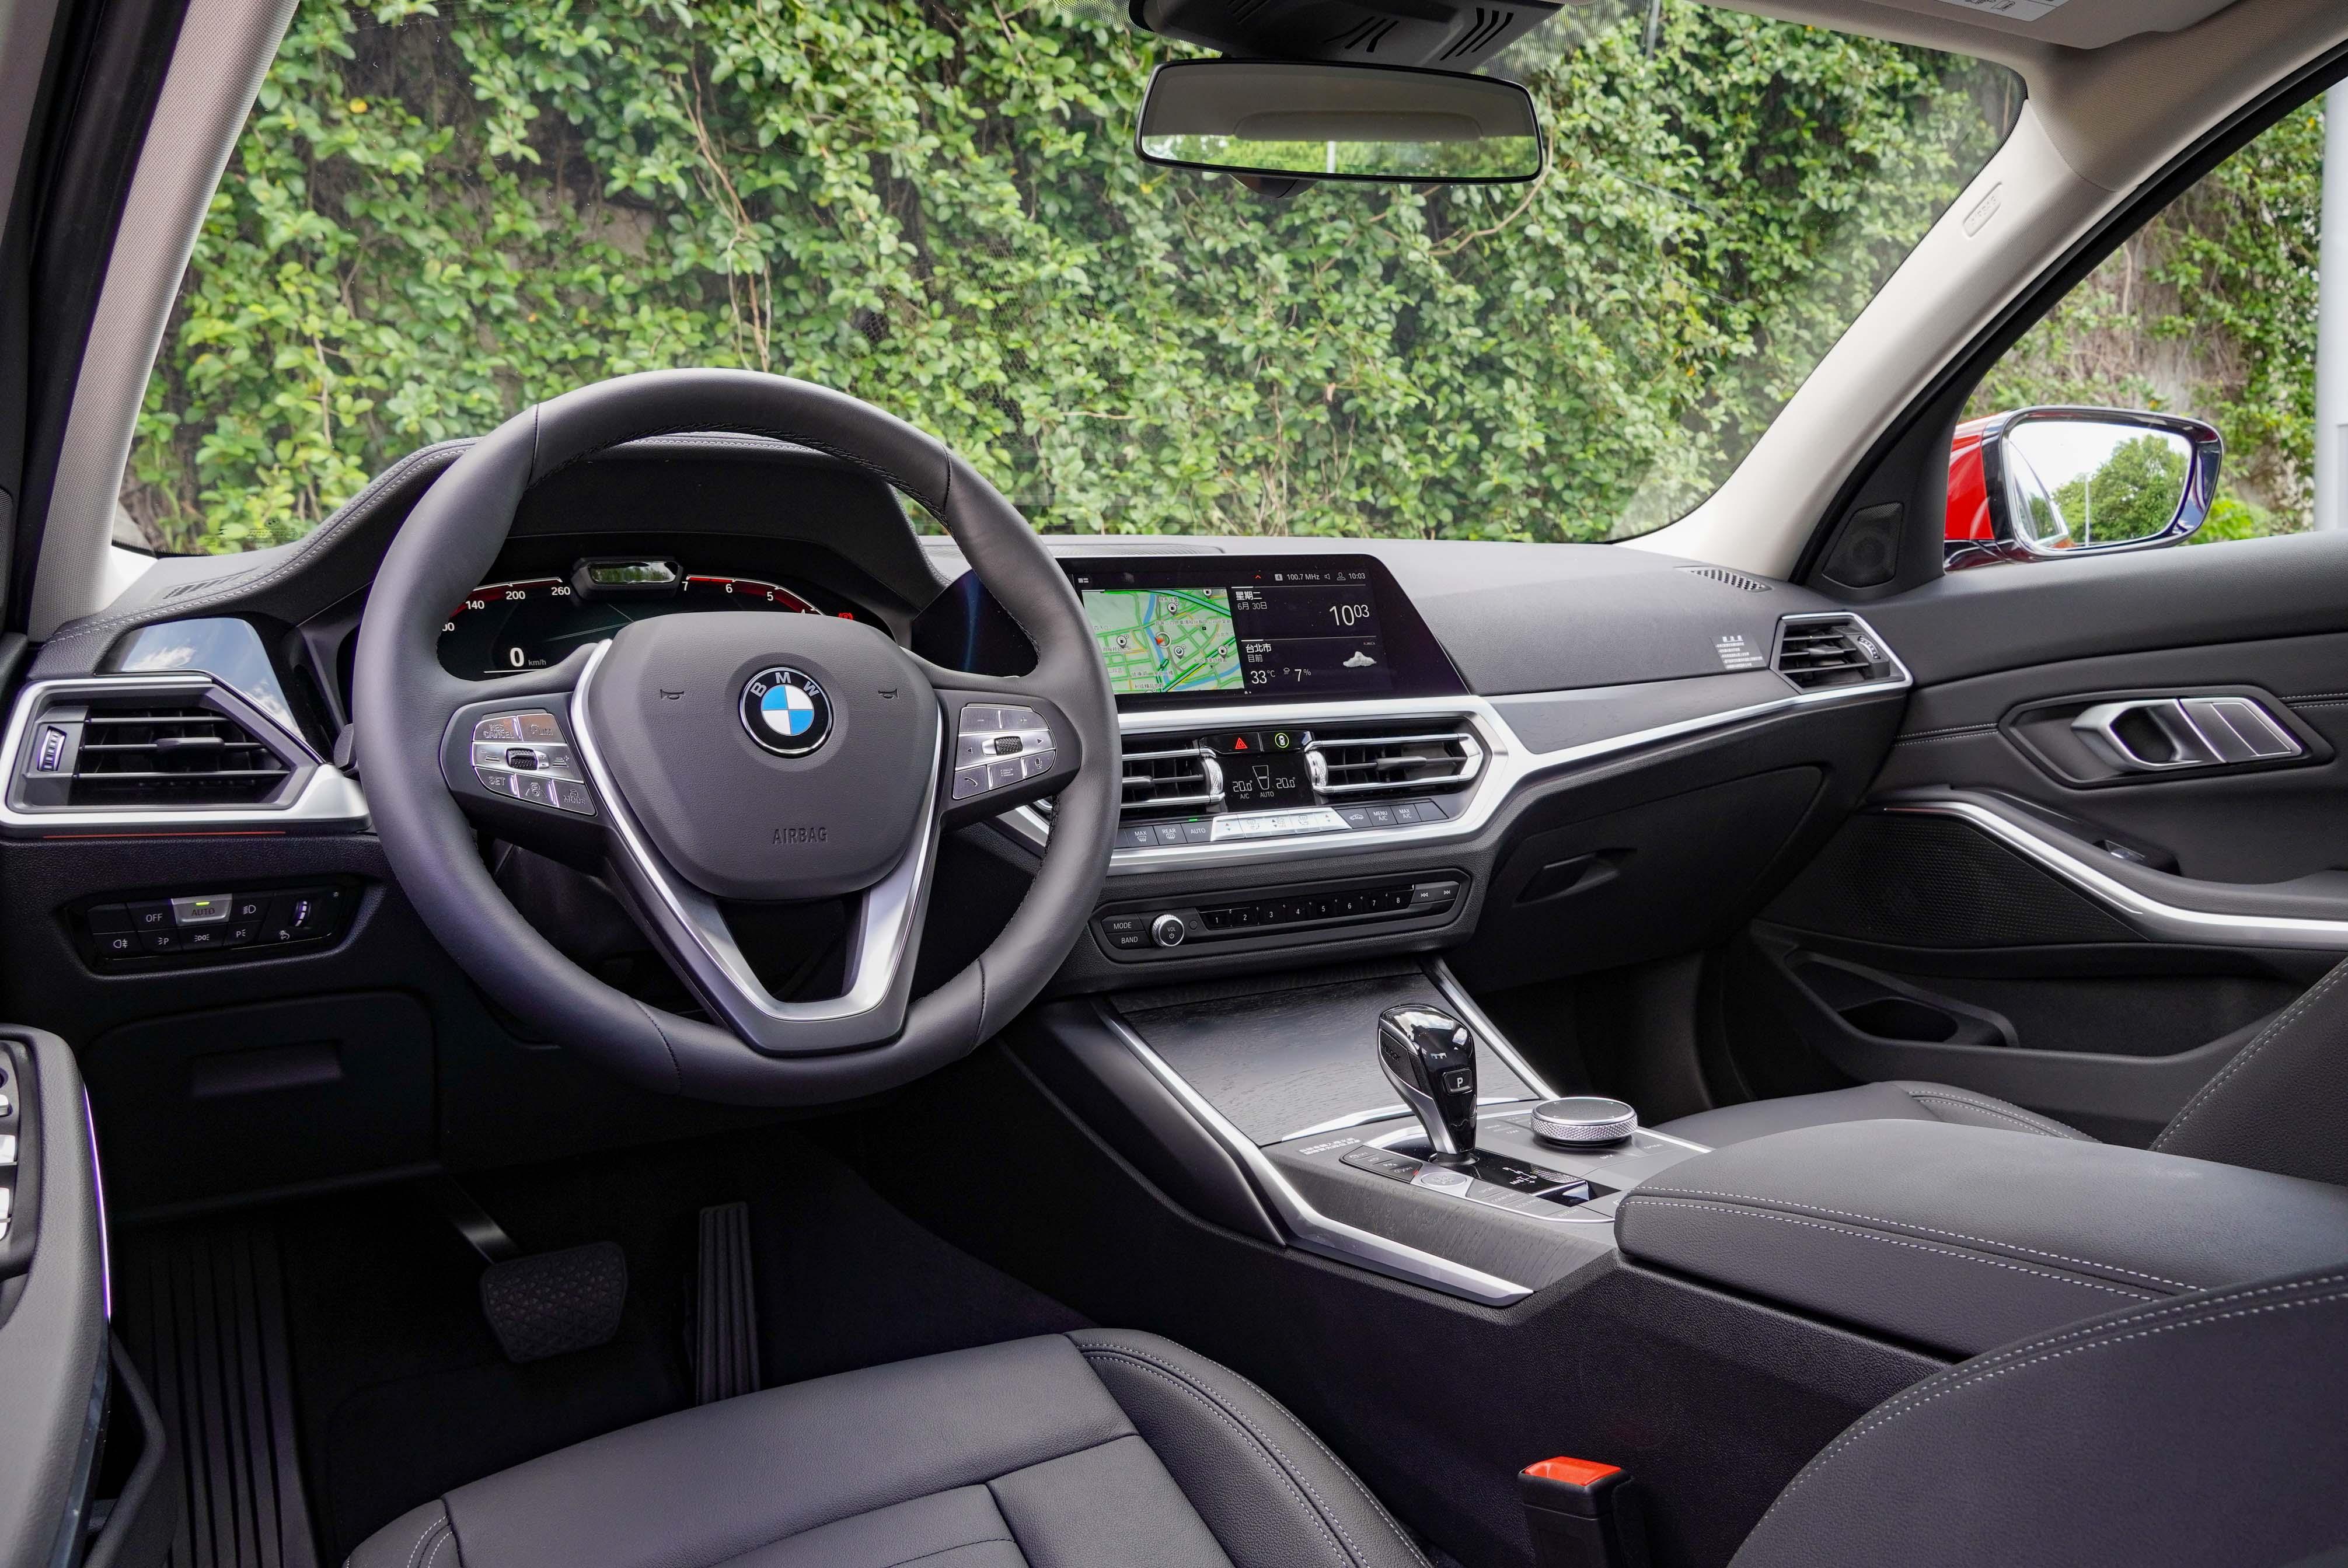 318i Luxury 內裝鋪陳與高階車型差異不大,駕駛導向的設計與用料搭配依然非常討喜。